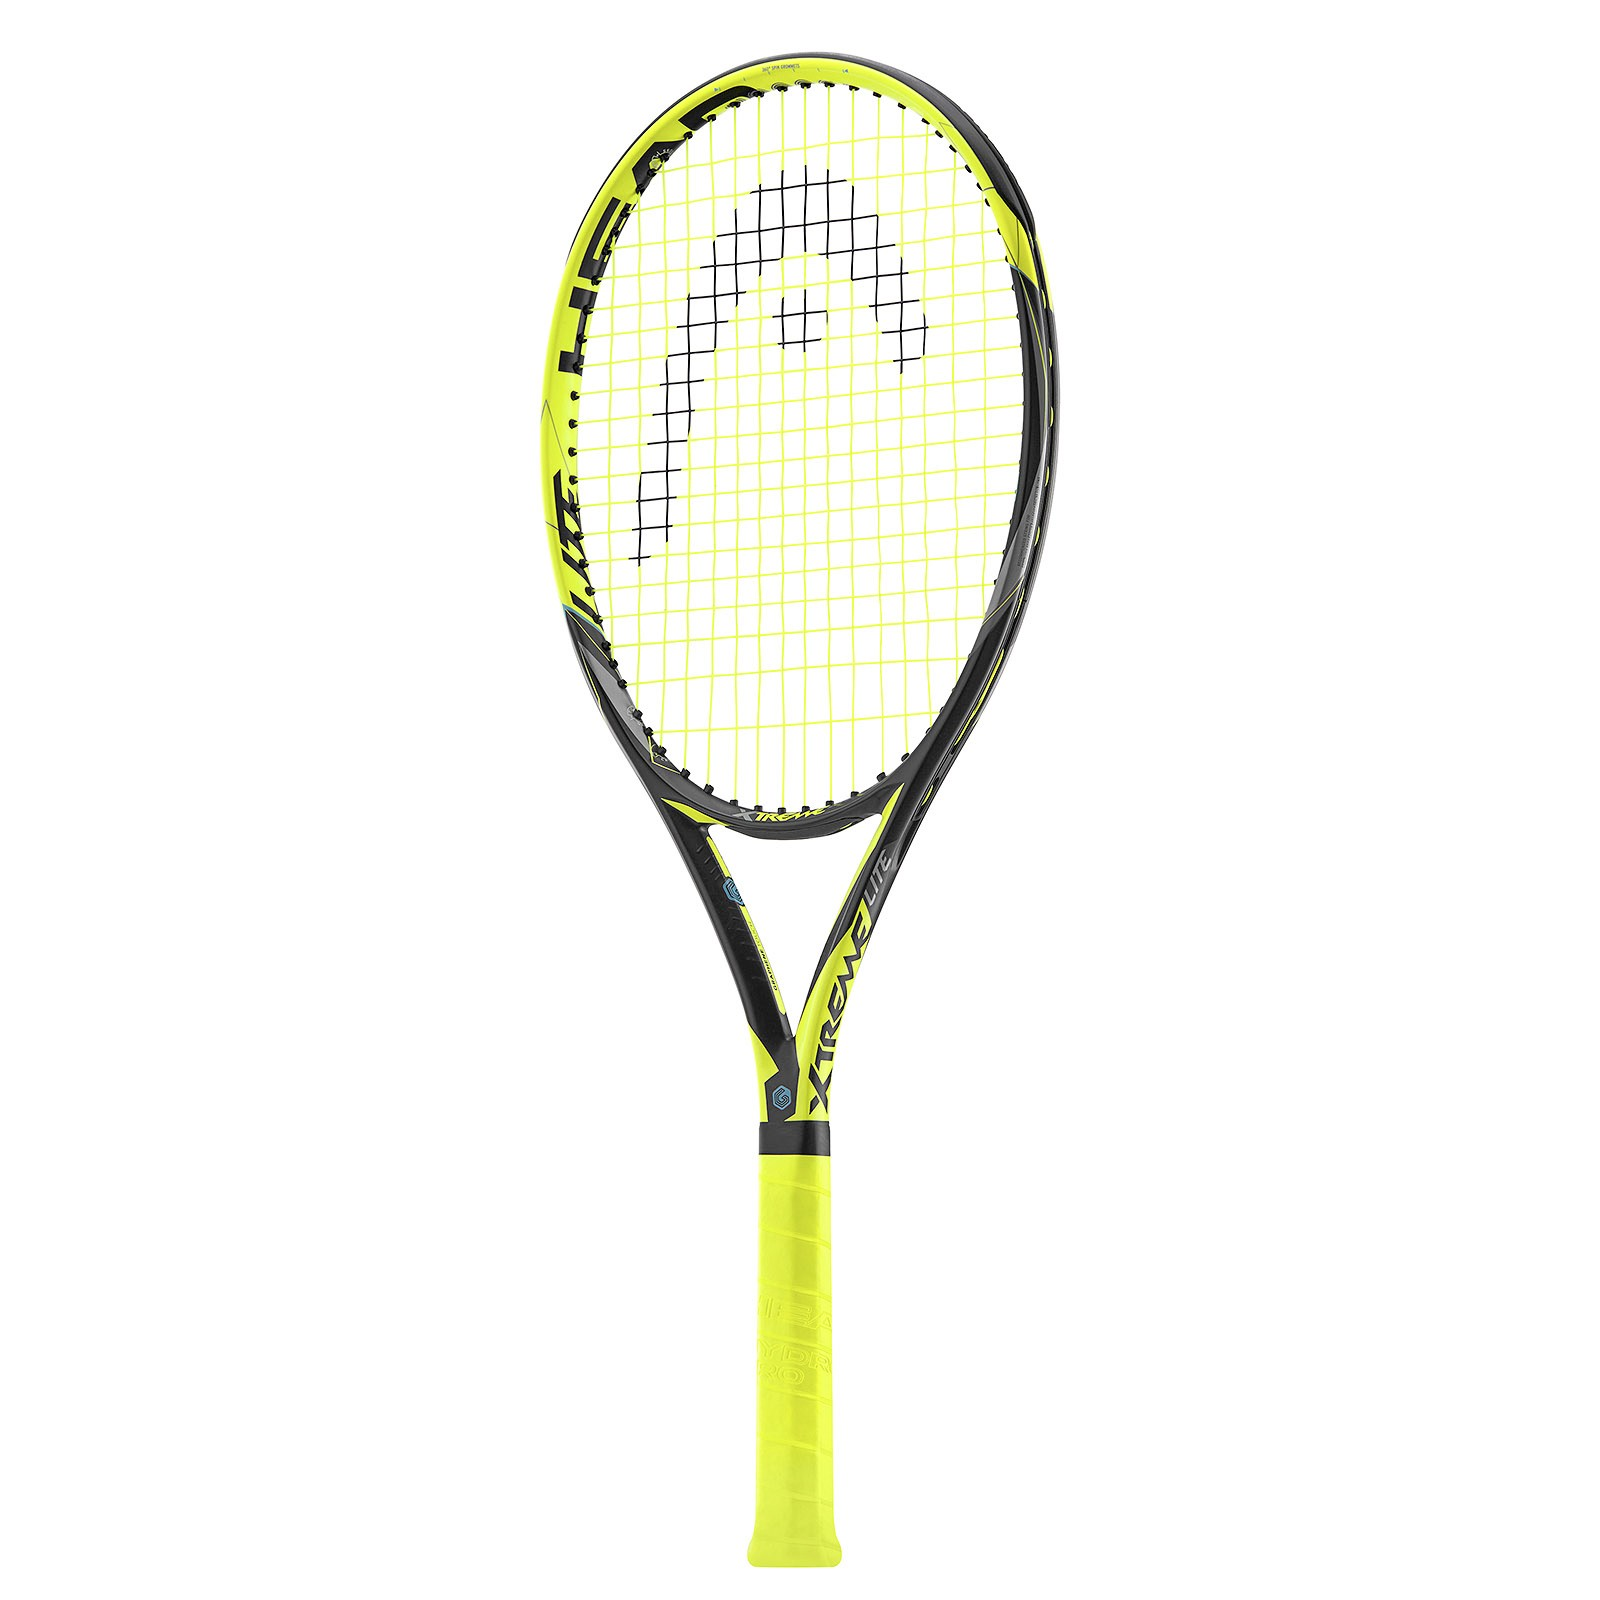 Rakieta tenisowa Head Graphene Touch Extreme Lite